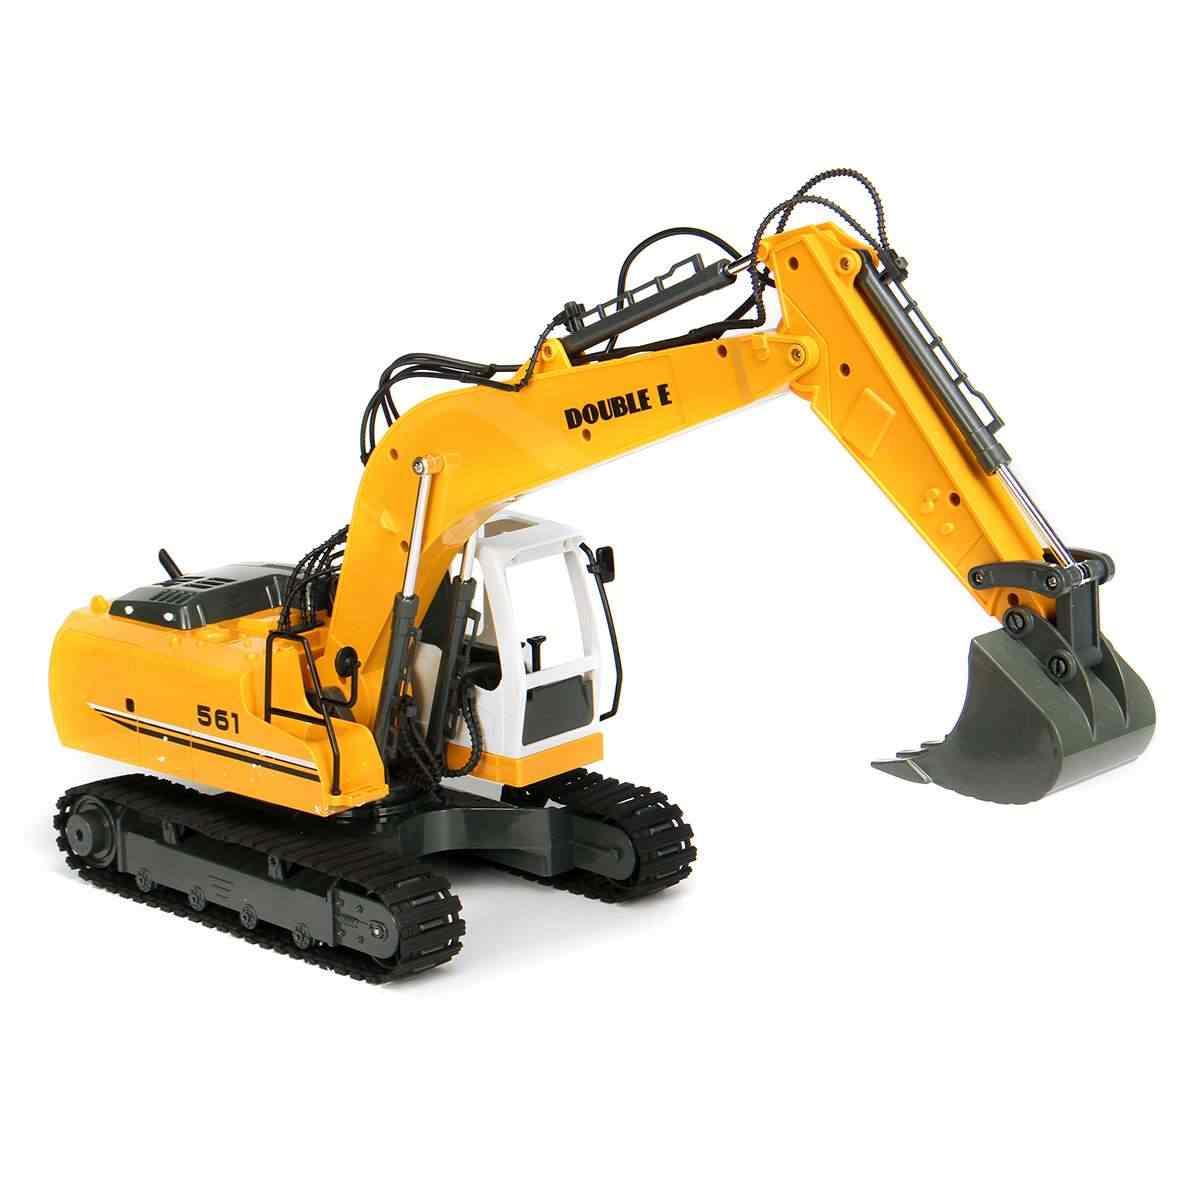 16 Channel 2.4G RC Excavator Mainan Anak Anak Laki-laki Truk RC Mainan Hadiah Elektronik RC Teknik Mobil Traktor Crawler penggali Model